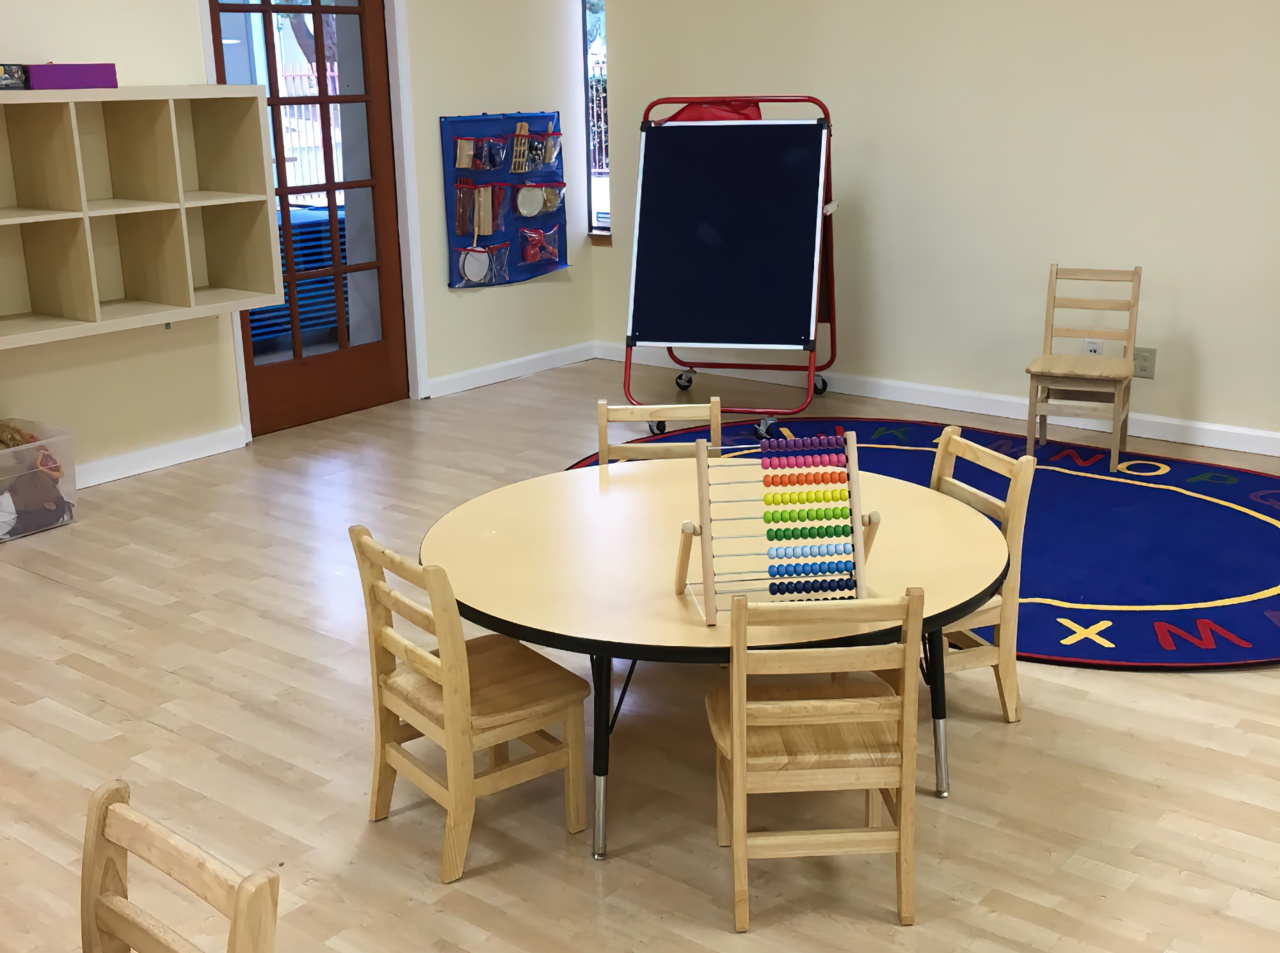 Spanish Immersion School & Daycare 2